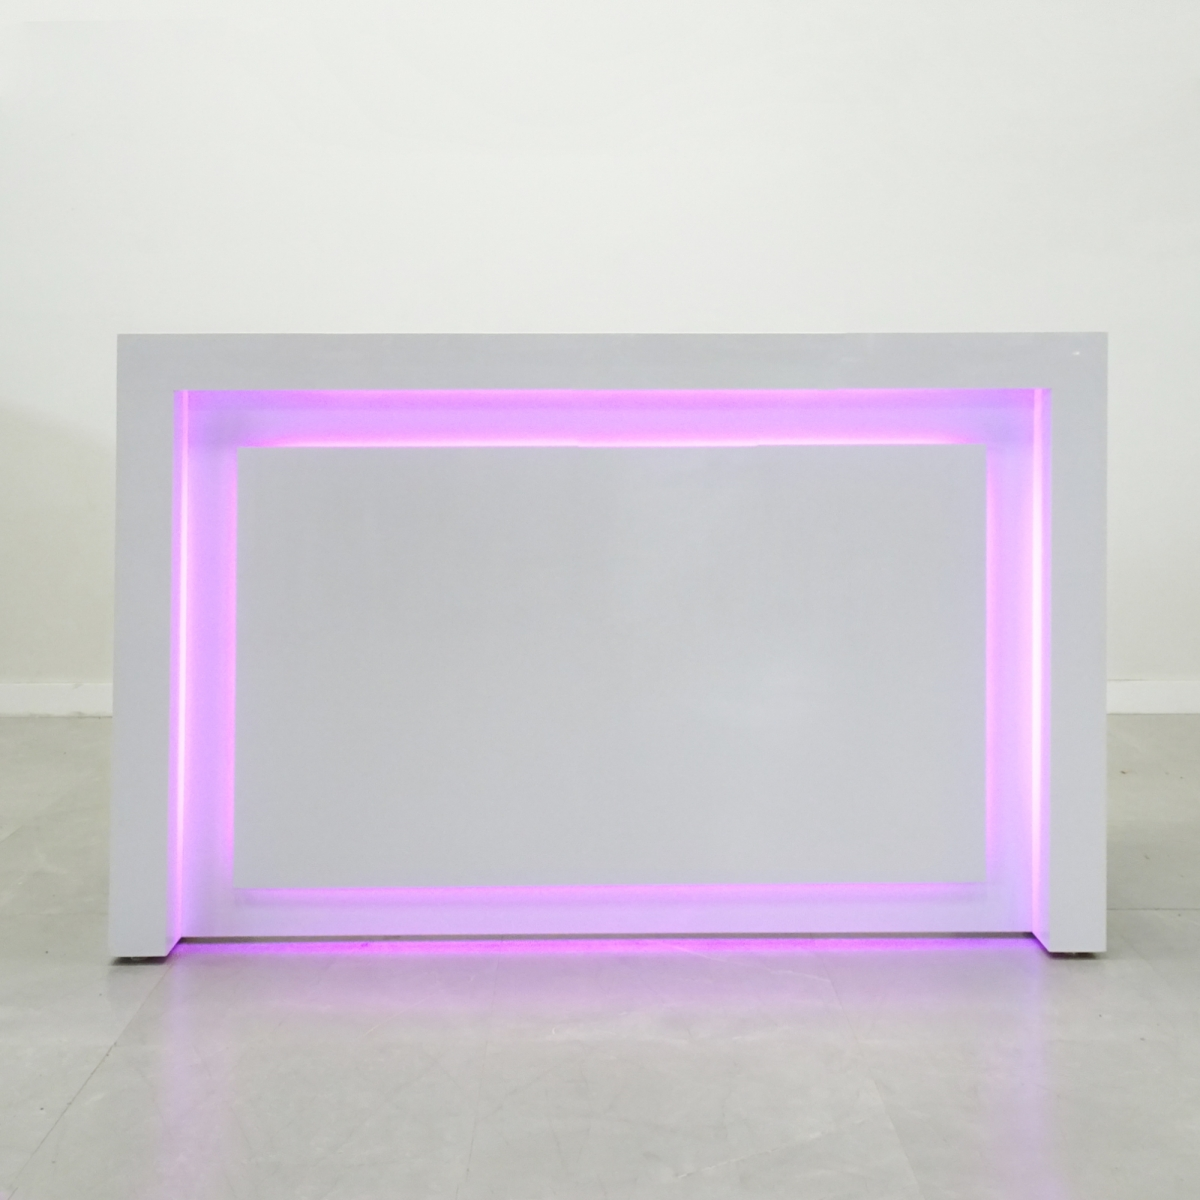 72 In. New York Reception Desk in White Glass Laminate